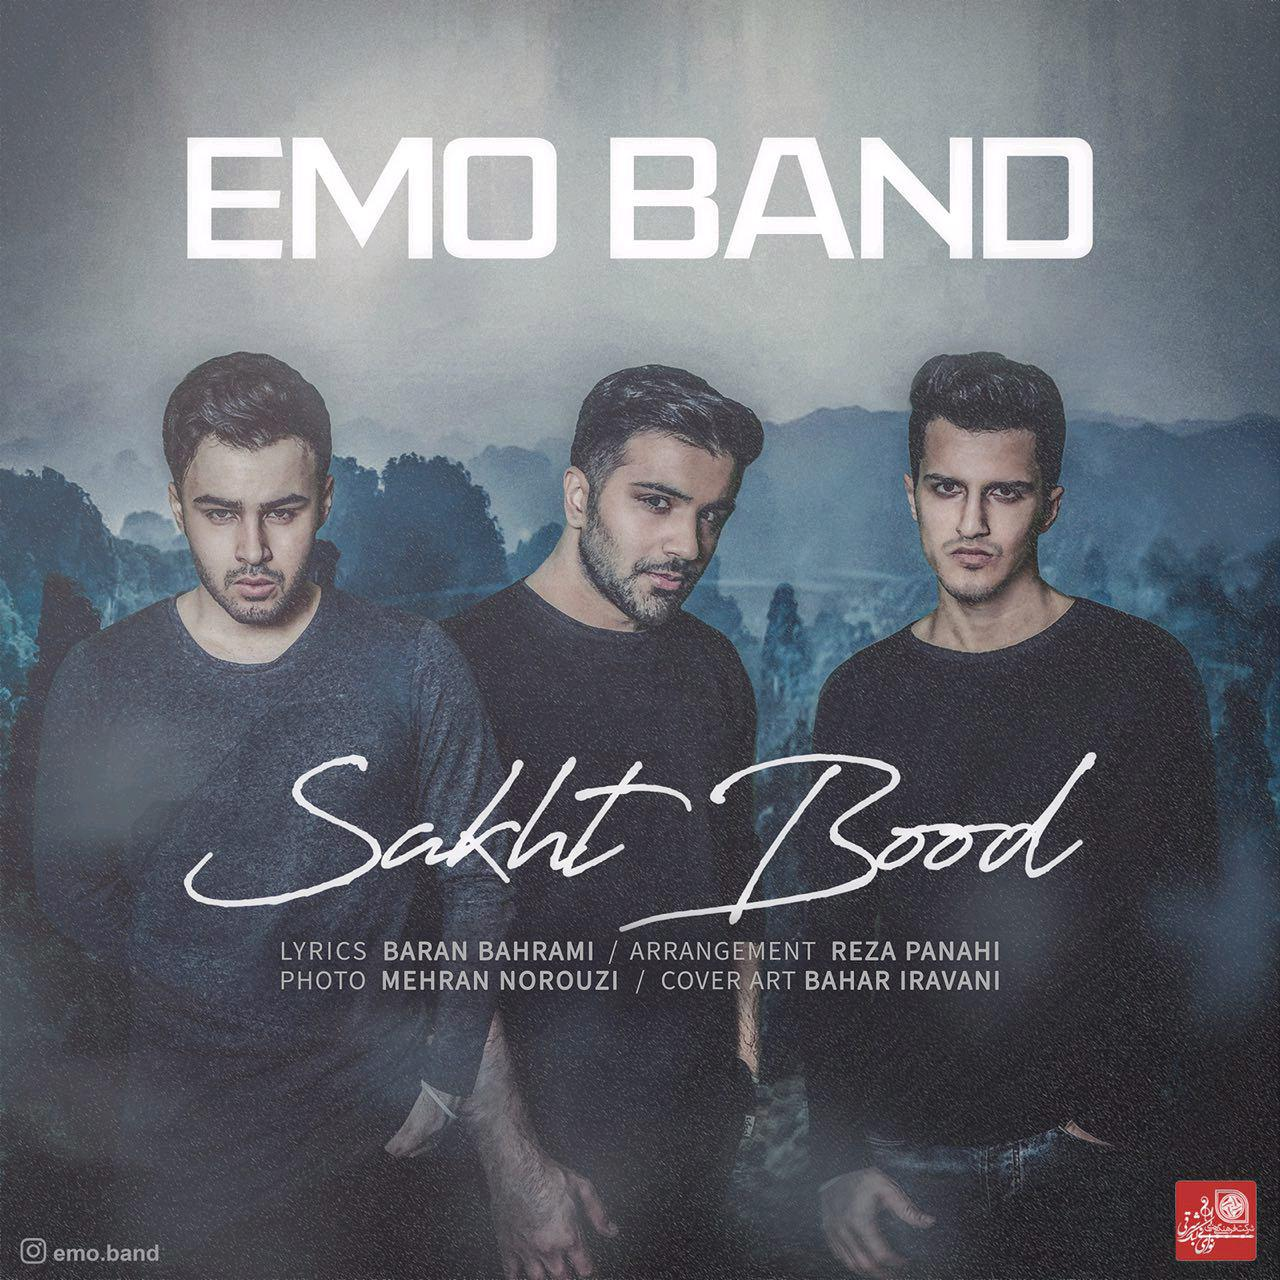 EMO Band – Sakht Bood